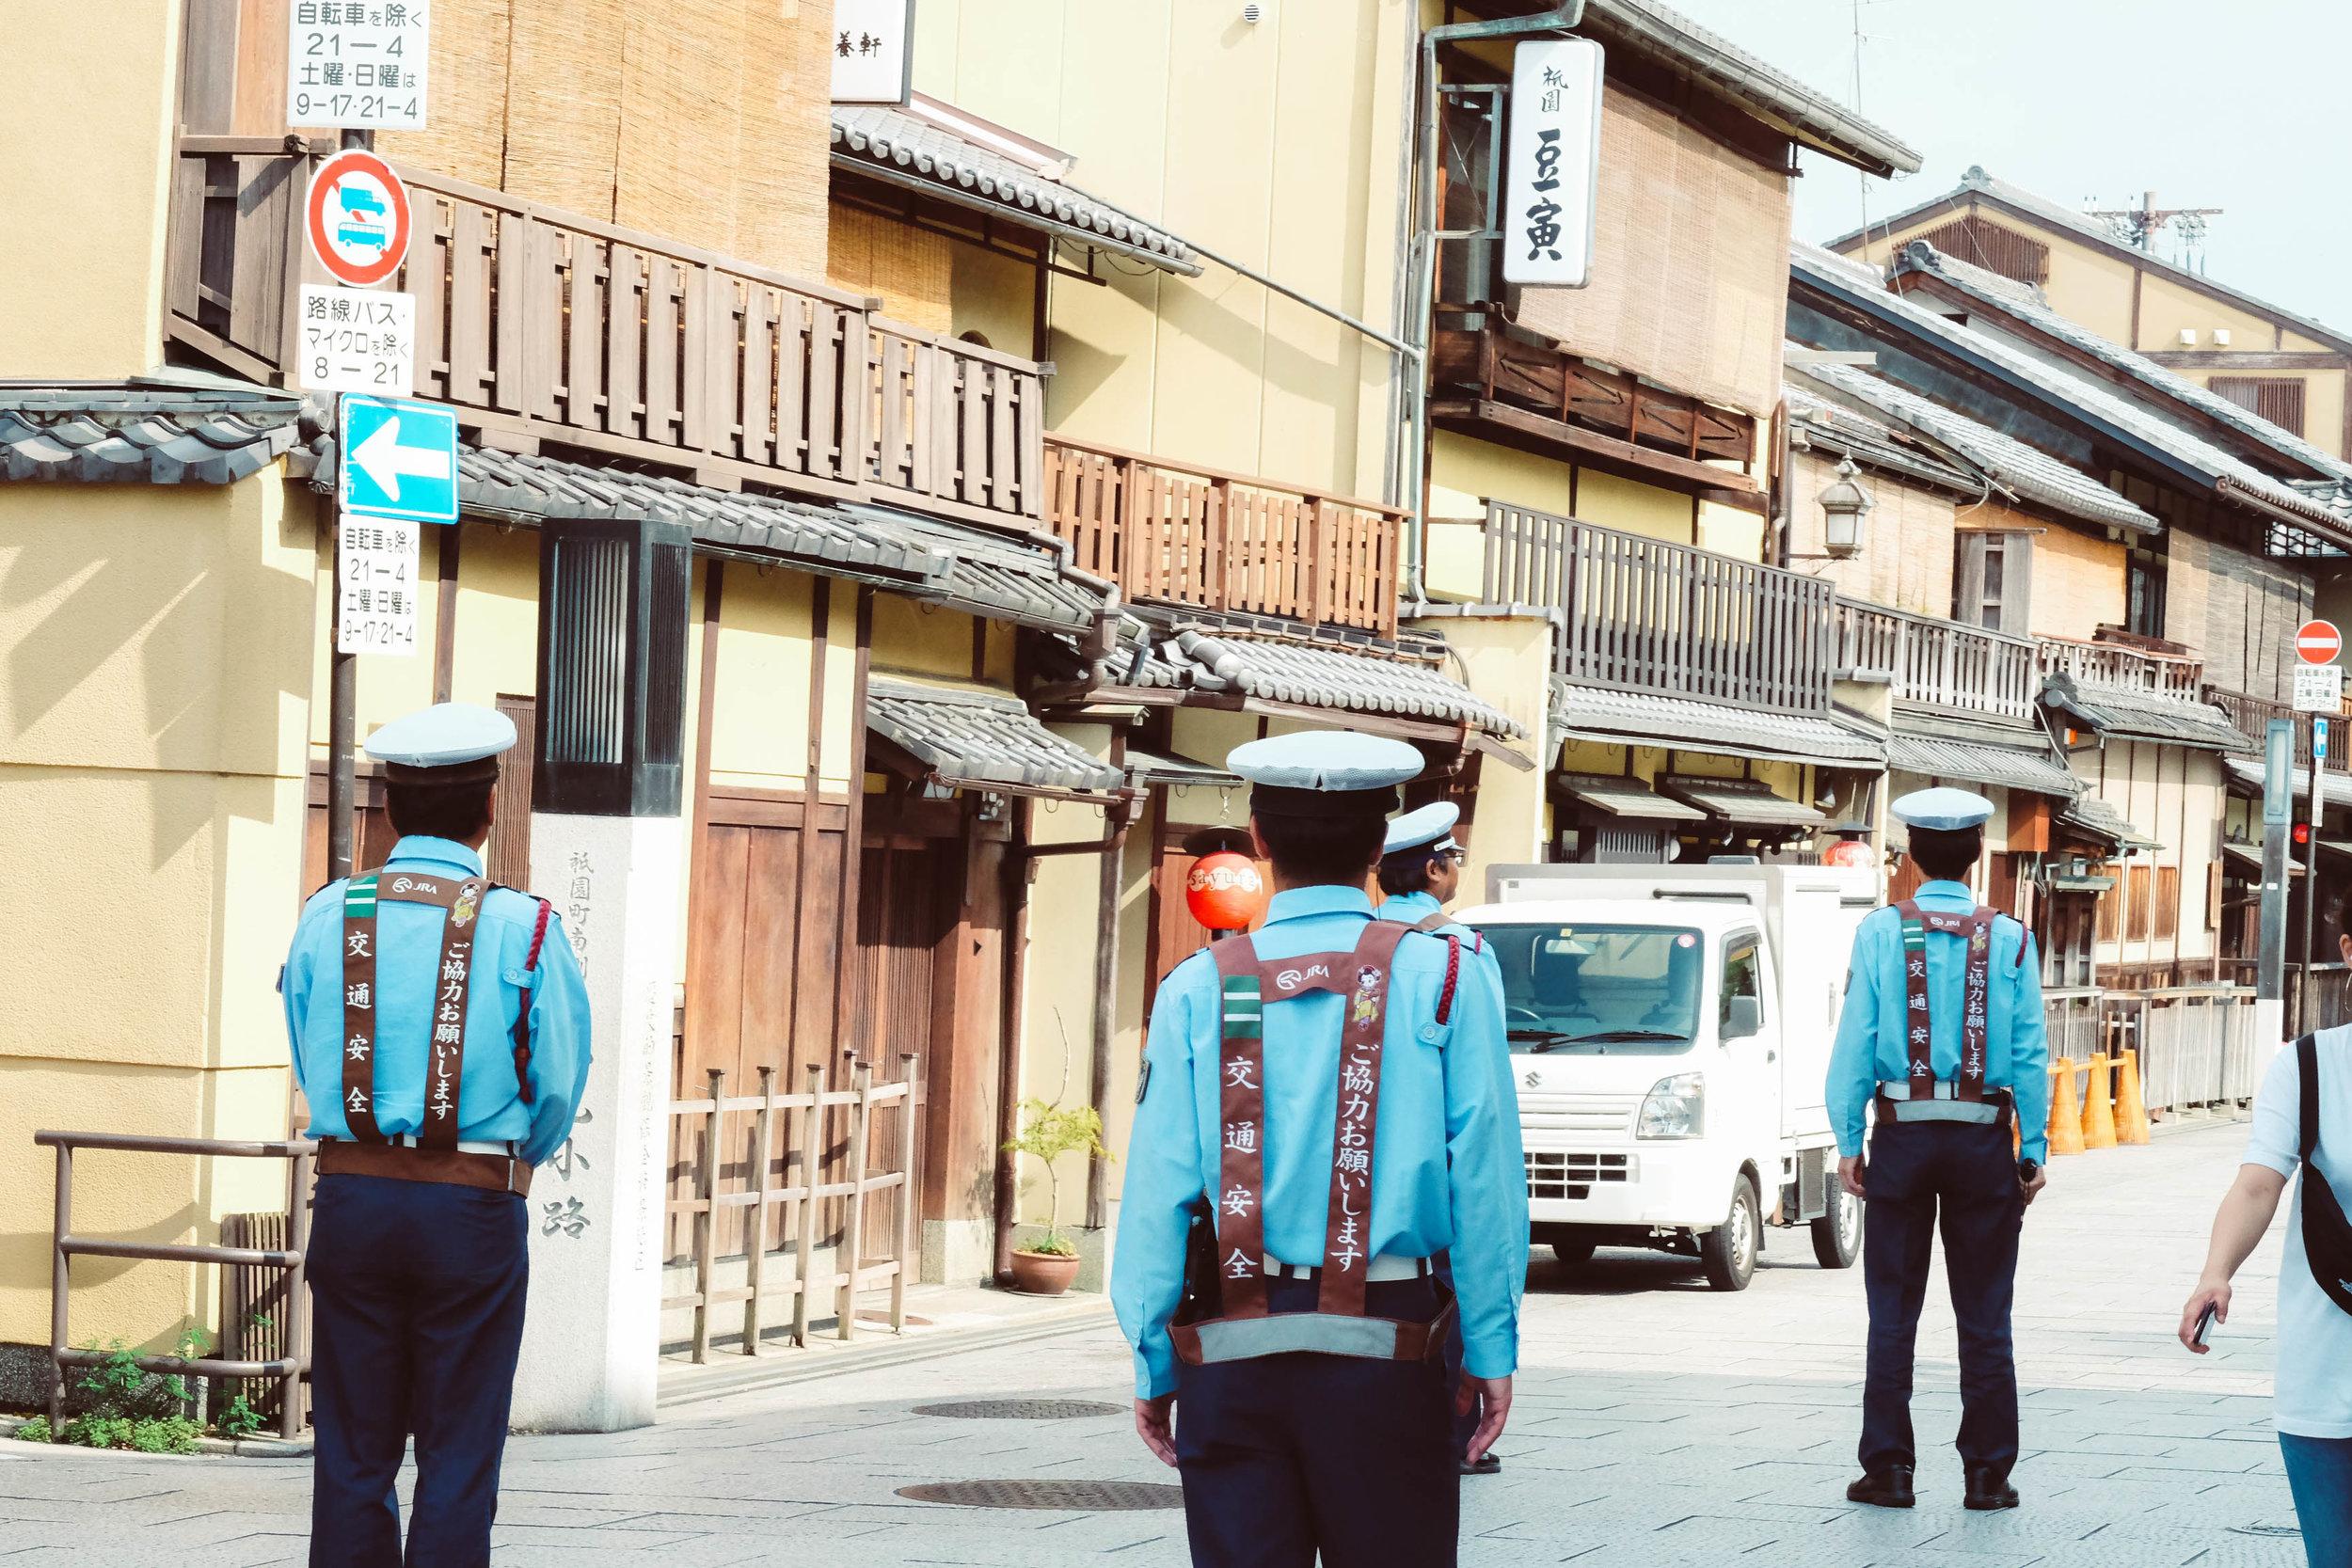 8.31.19_kyoto-11.jpg